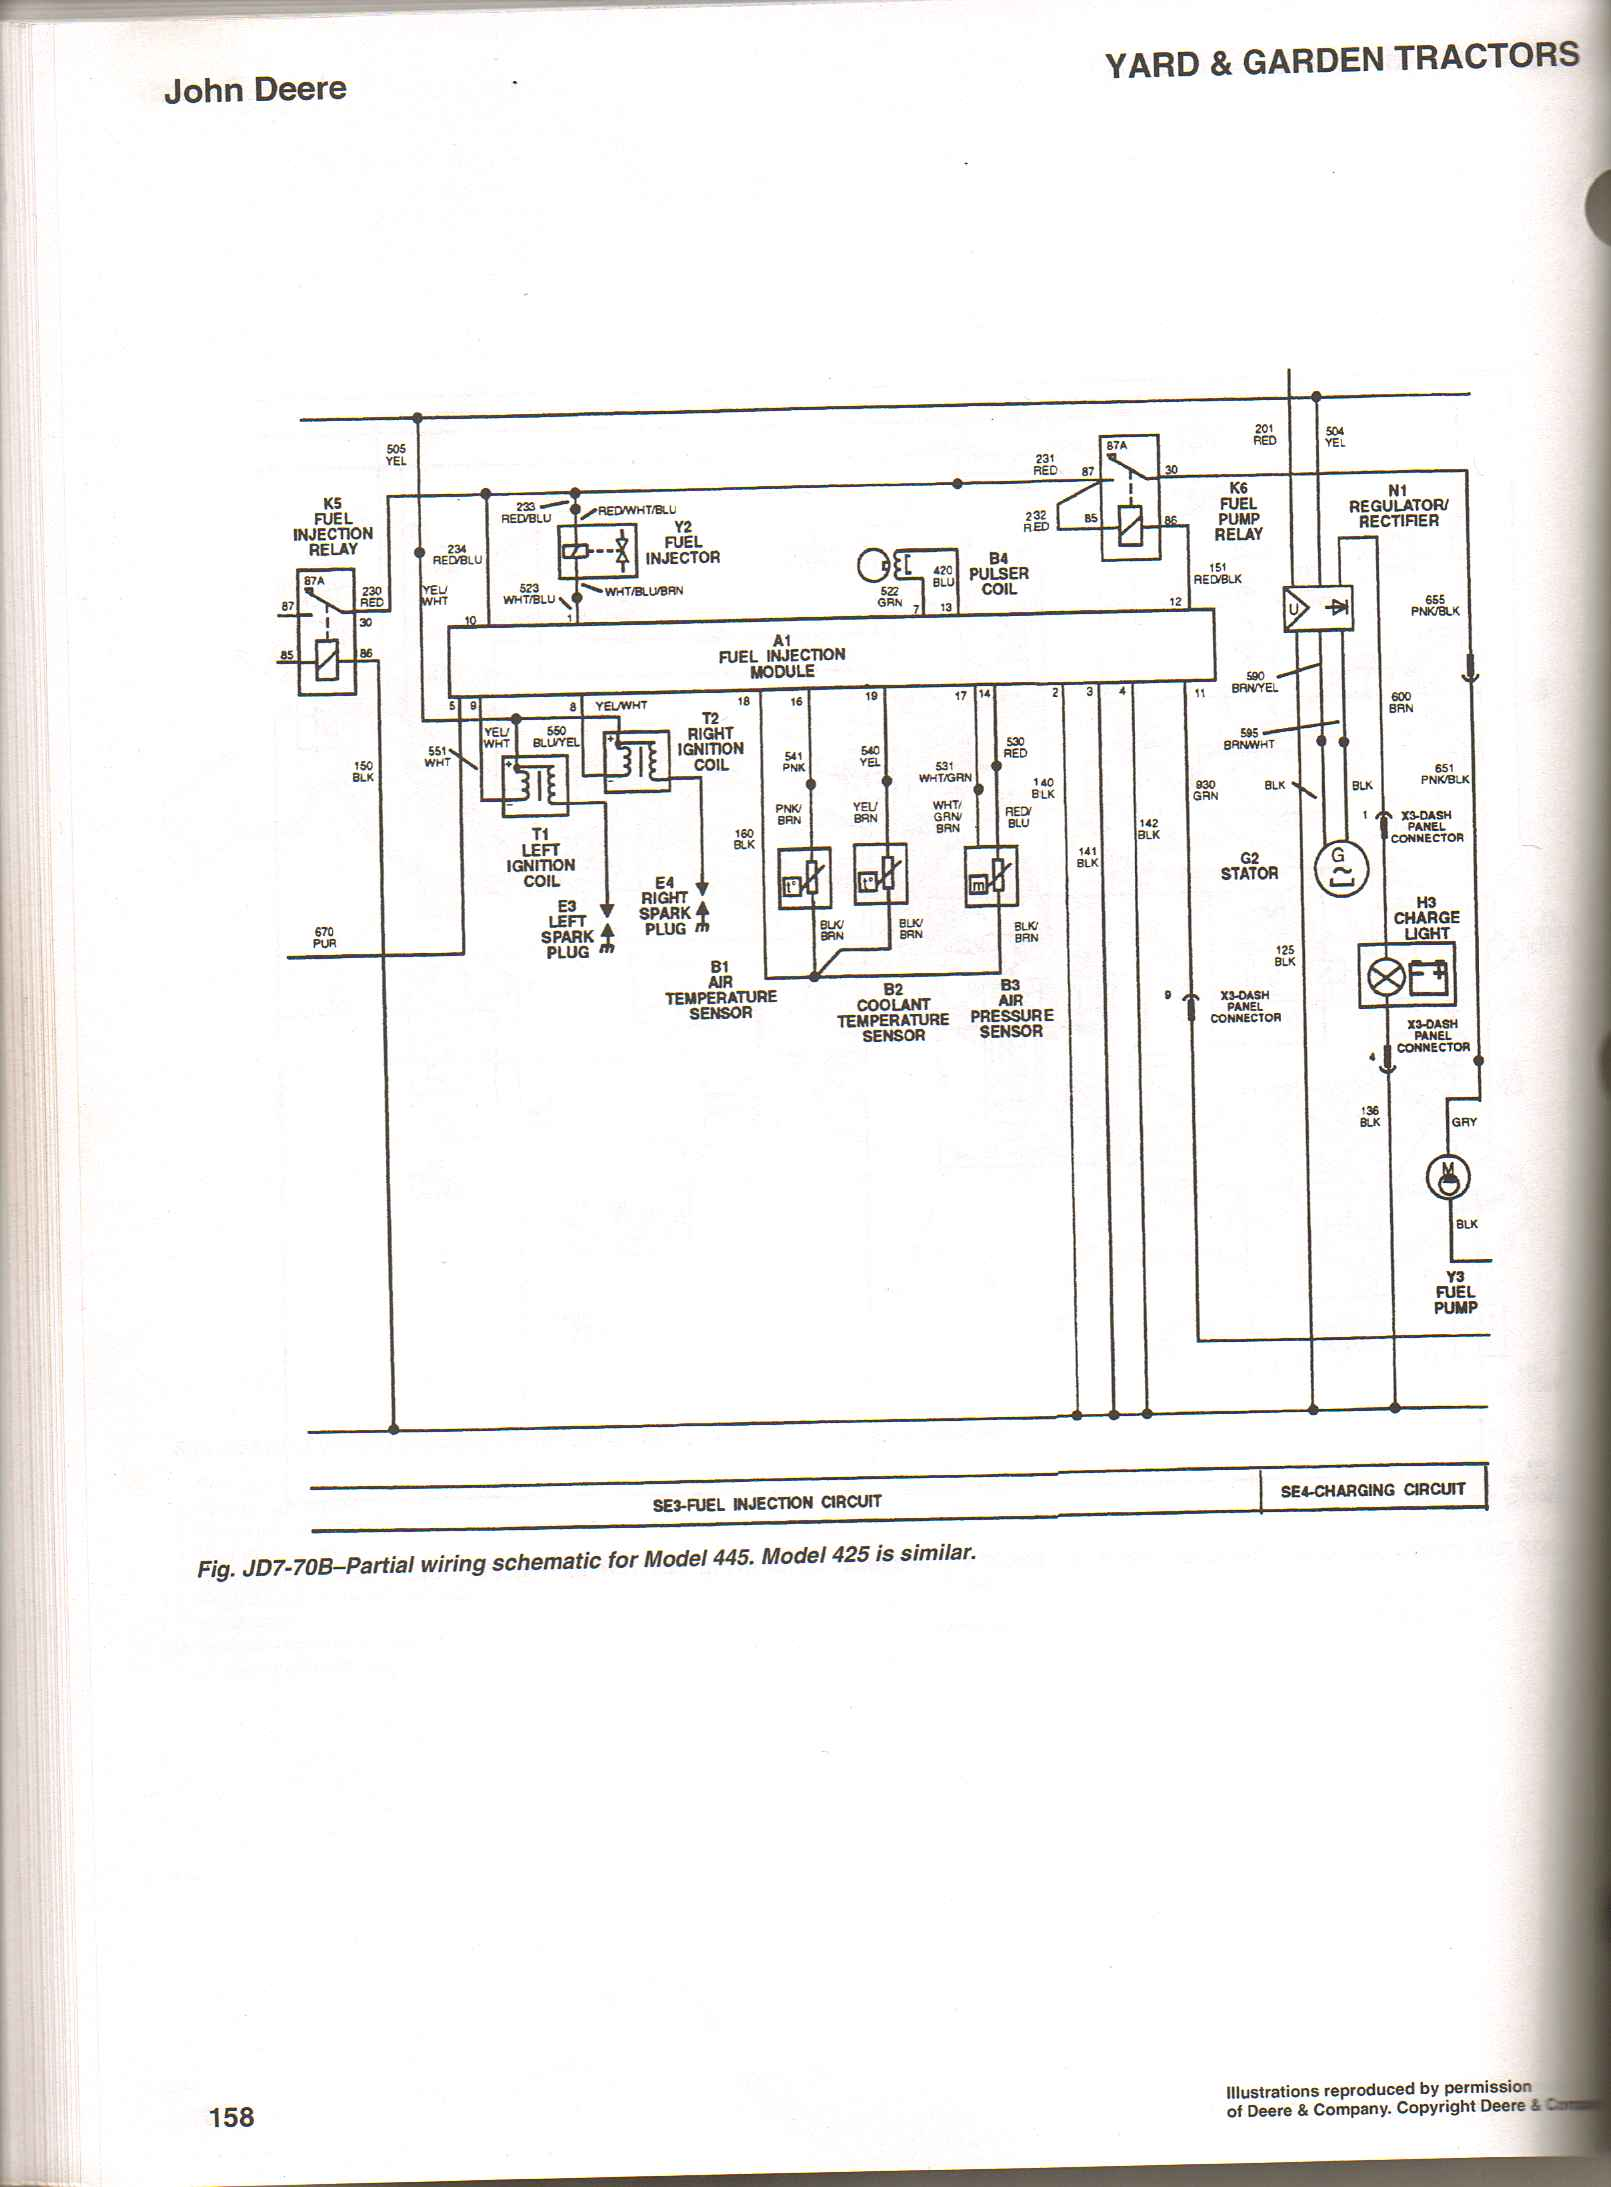 john deere 345 kawasaki wiring diagrams data wiring diagramjohn deere 445 wiring schematic wiring diagram john deere 345 kawasaki wiring diagrams